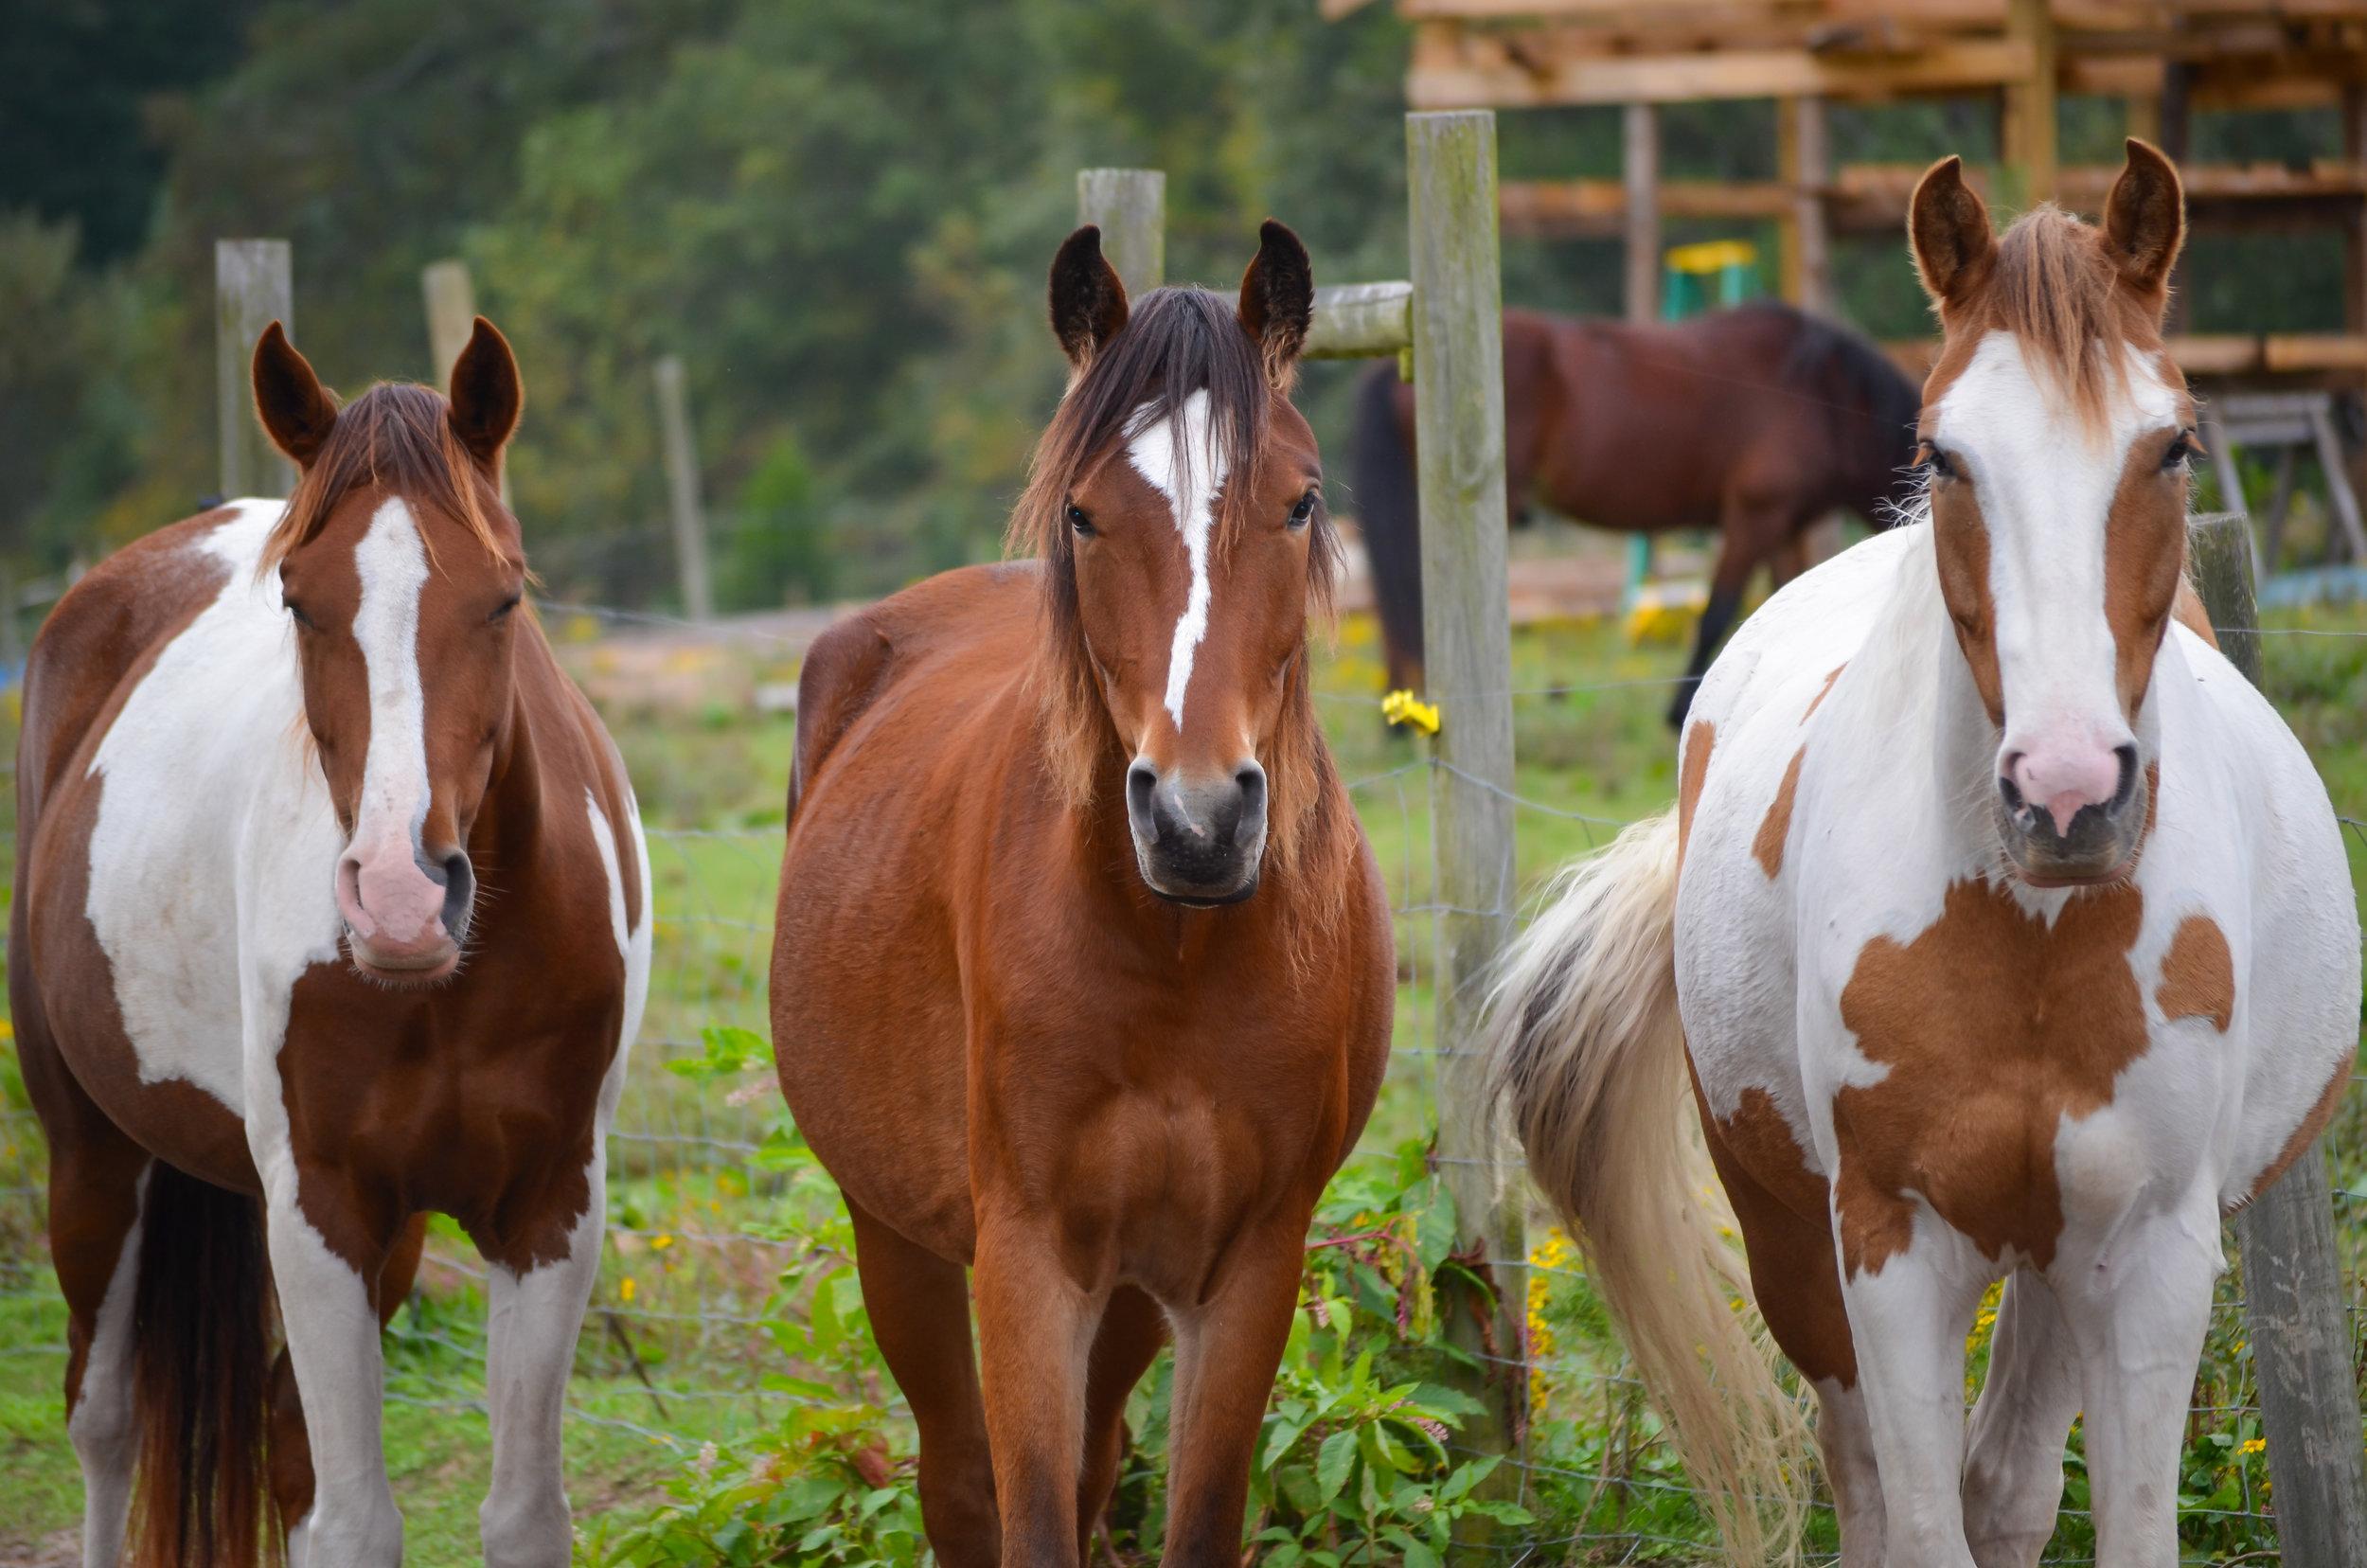 wild horses-smithfield-isle of wight county-virginia.jpg